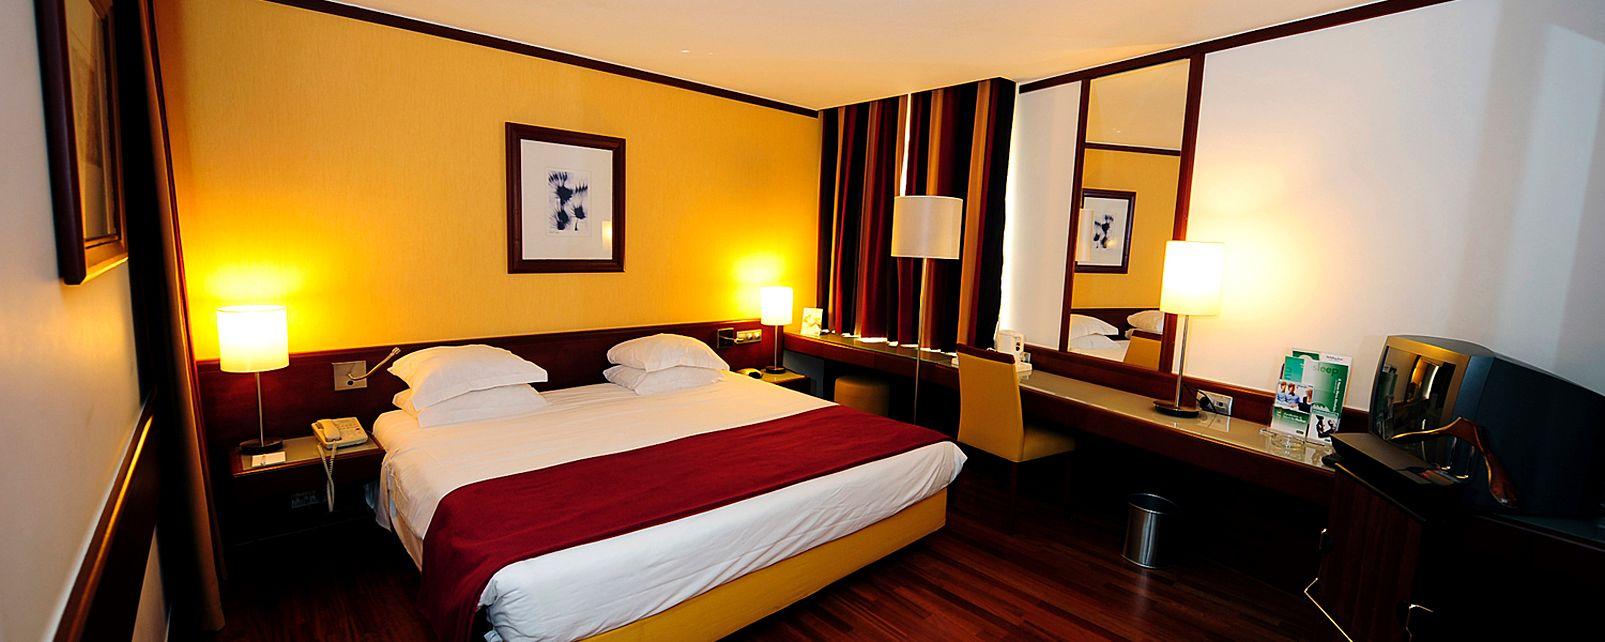 Hotel Holiday Inn Lisbon Continental